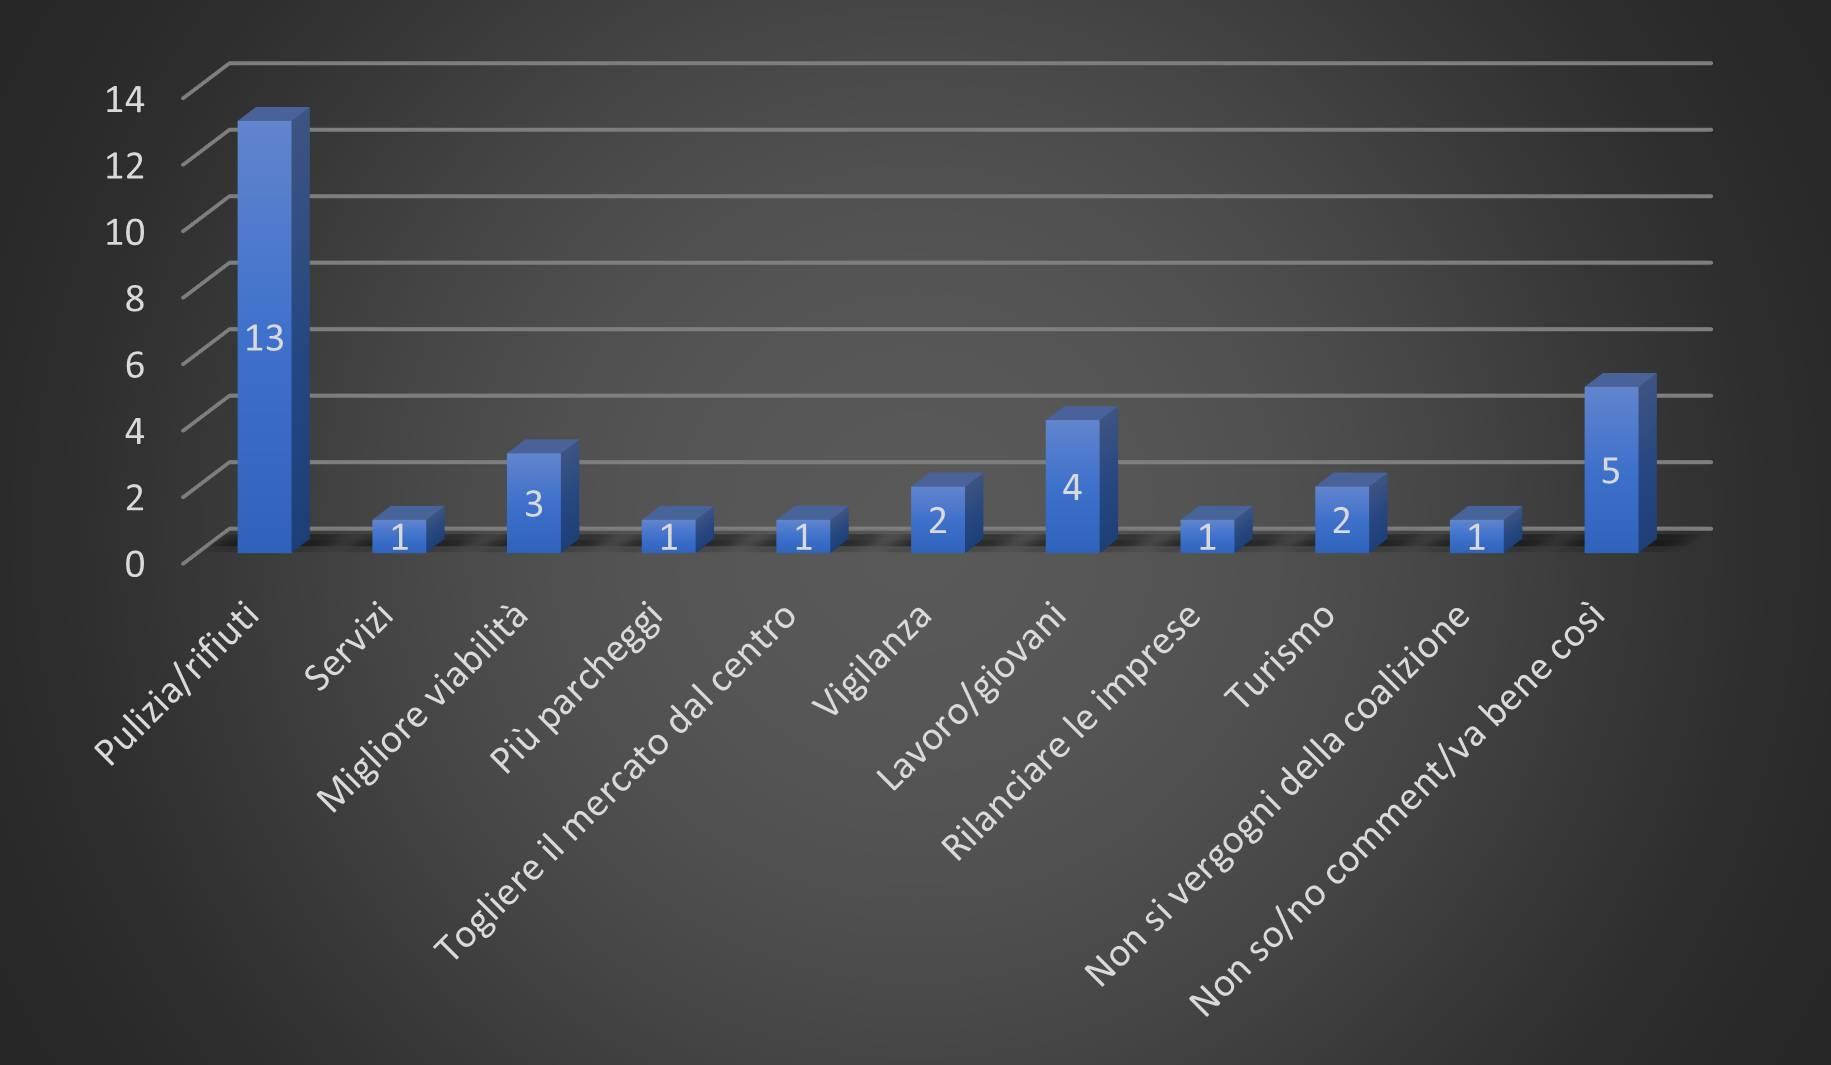 Grafico sondaggio 16 febbraio